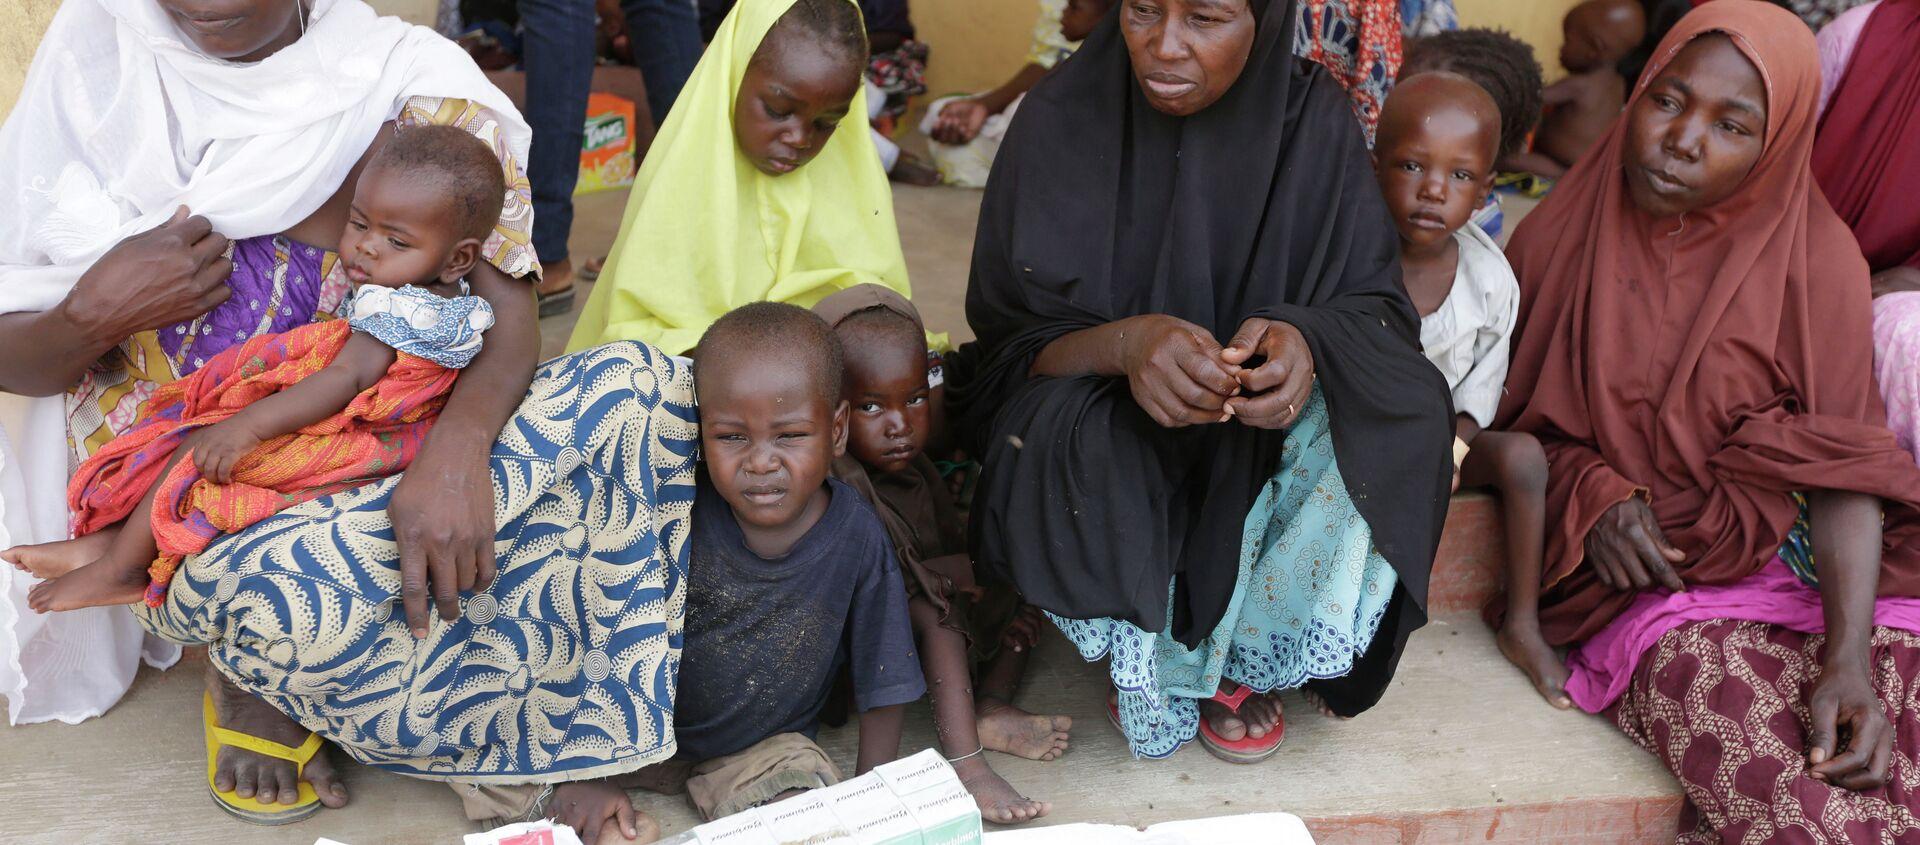 Donne e bambini liberati dai militari nigeriani da Boko Haram - Sputnik Italia, 1920, 26.02.2021